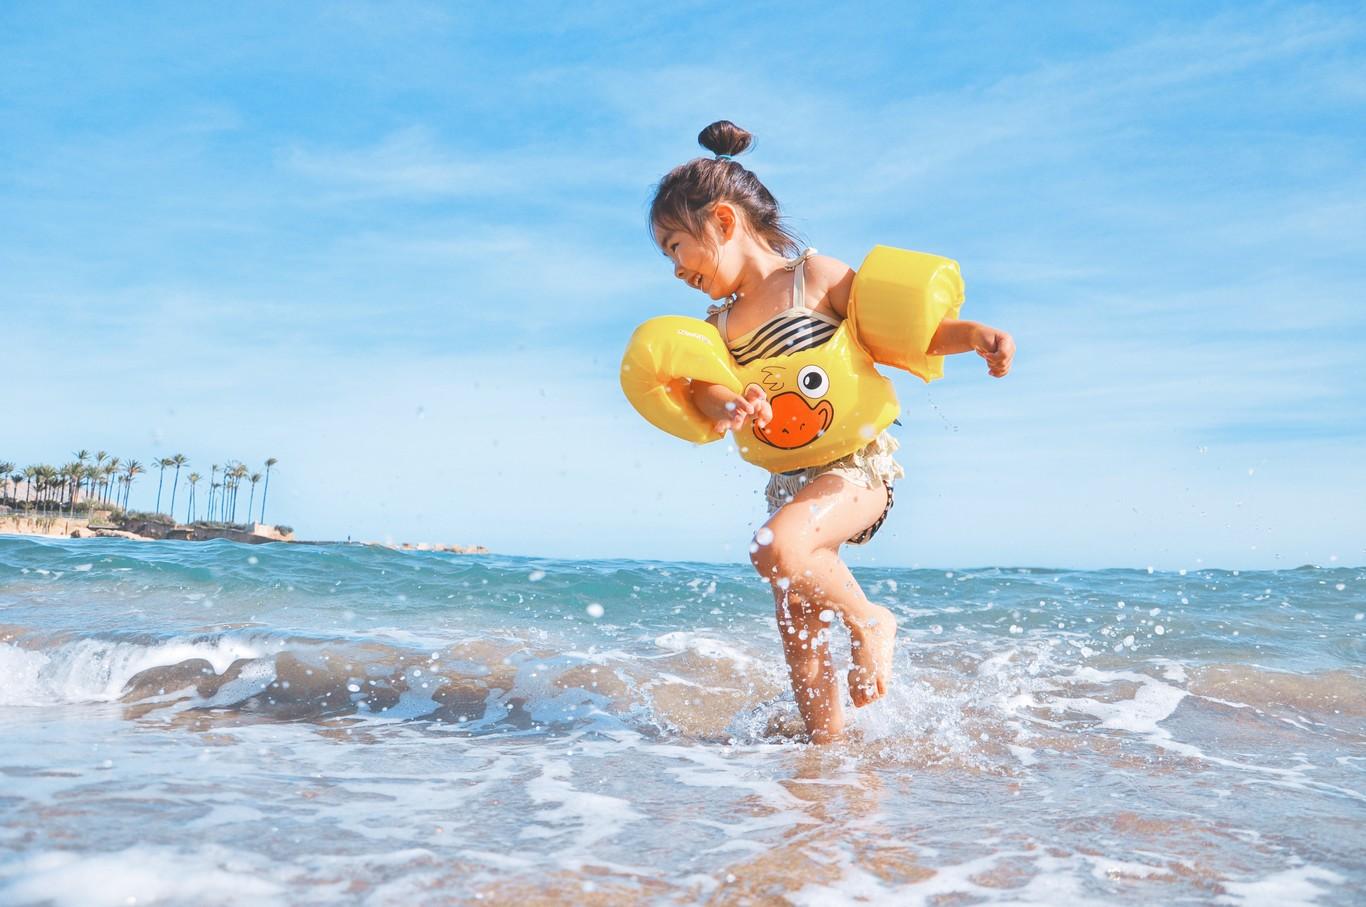 Planes e ideas para hacer deporte veraniego en familia